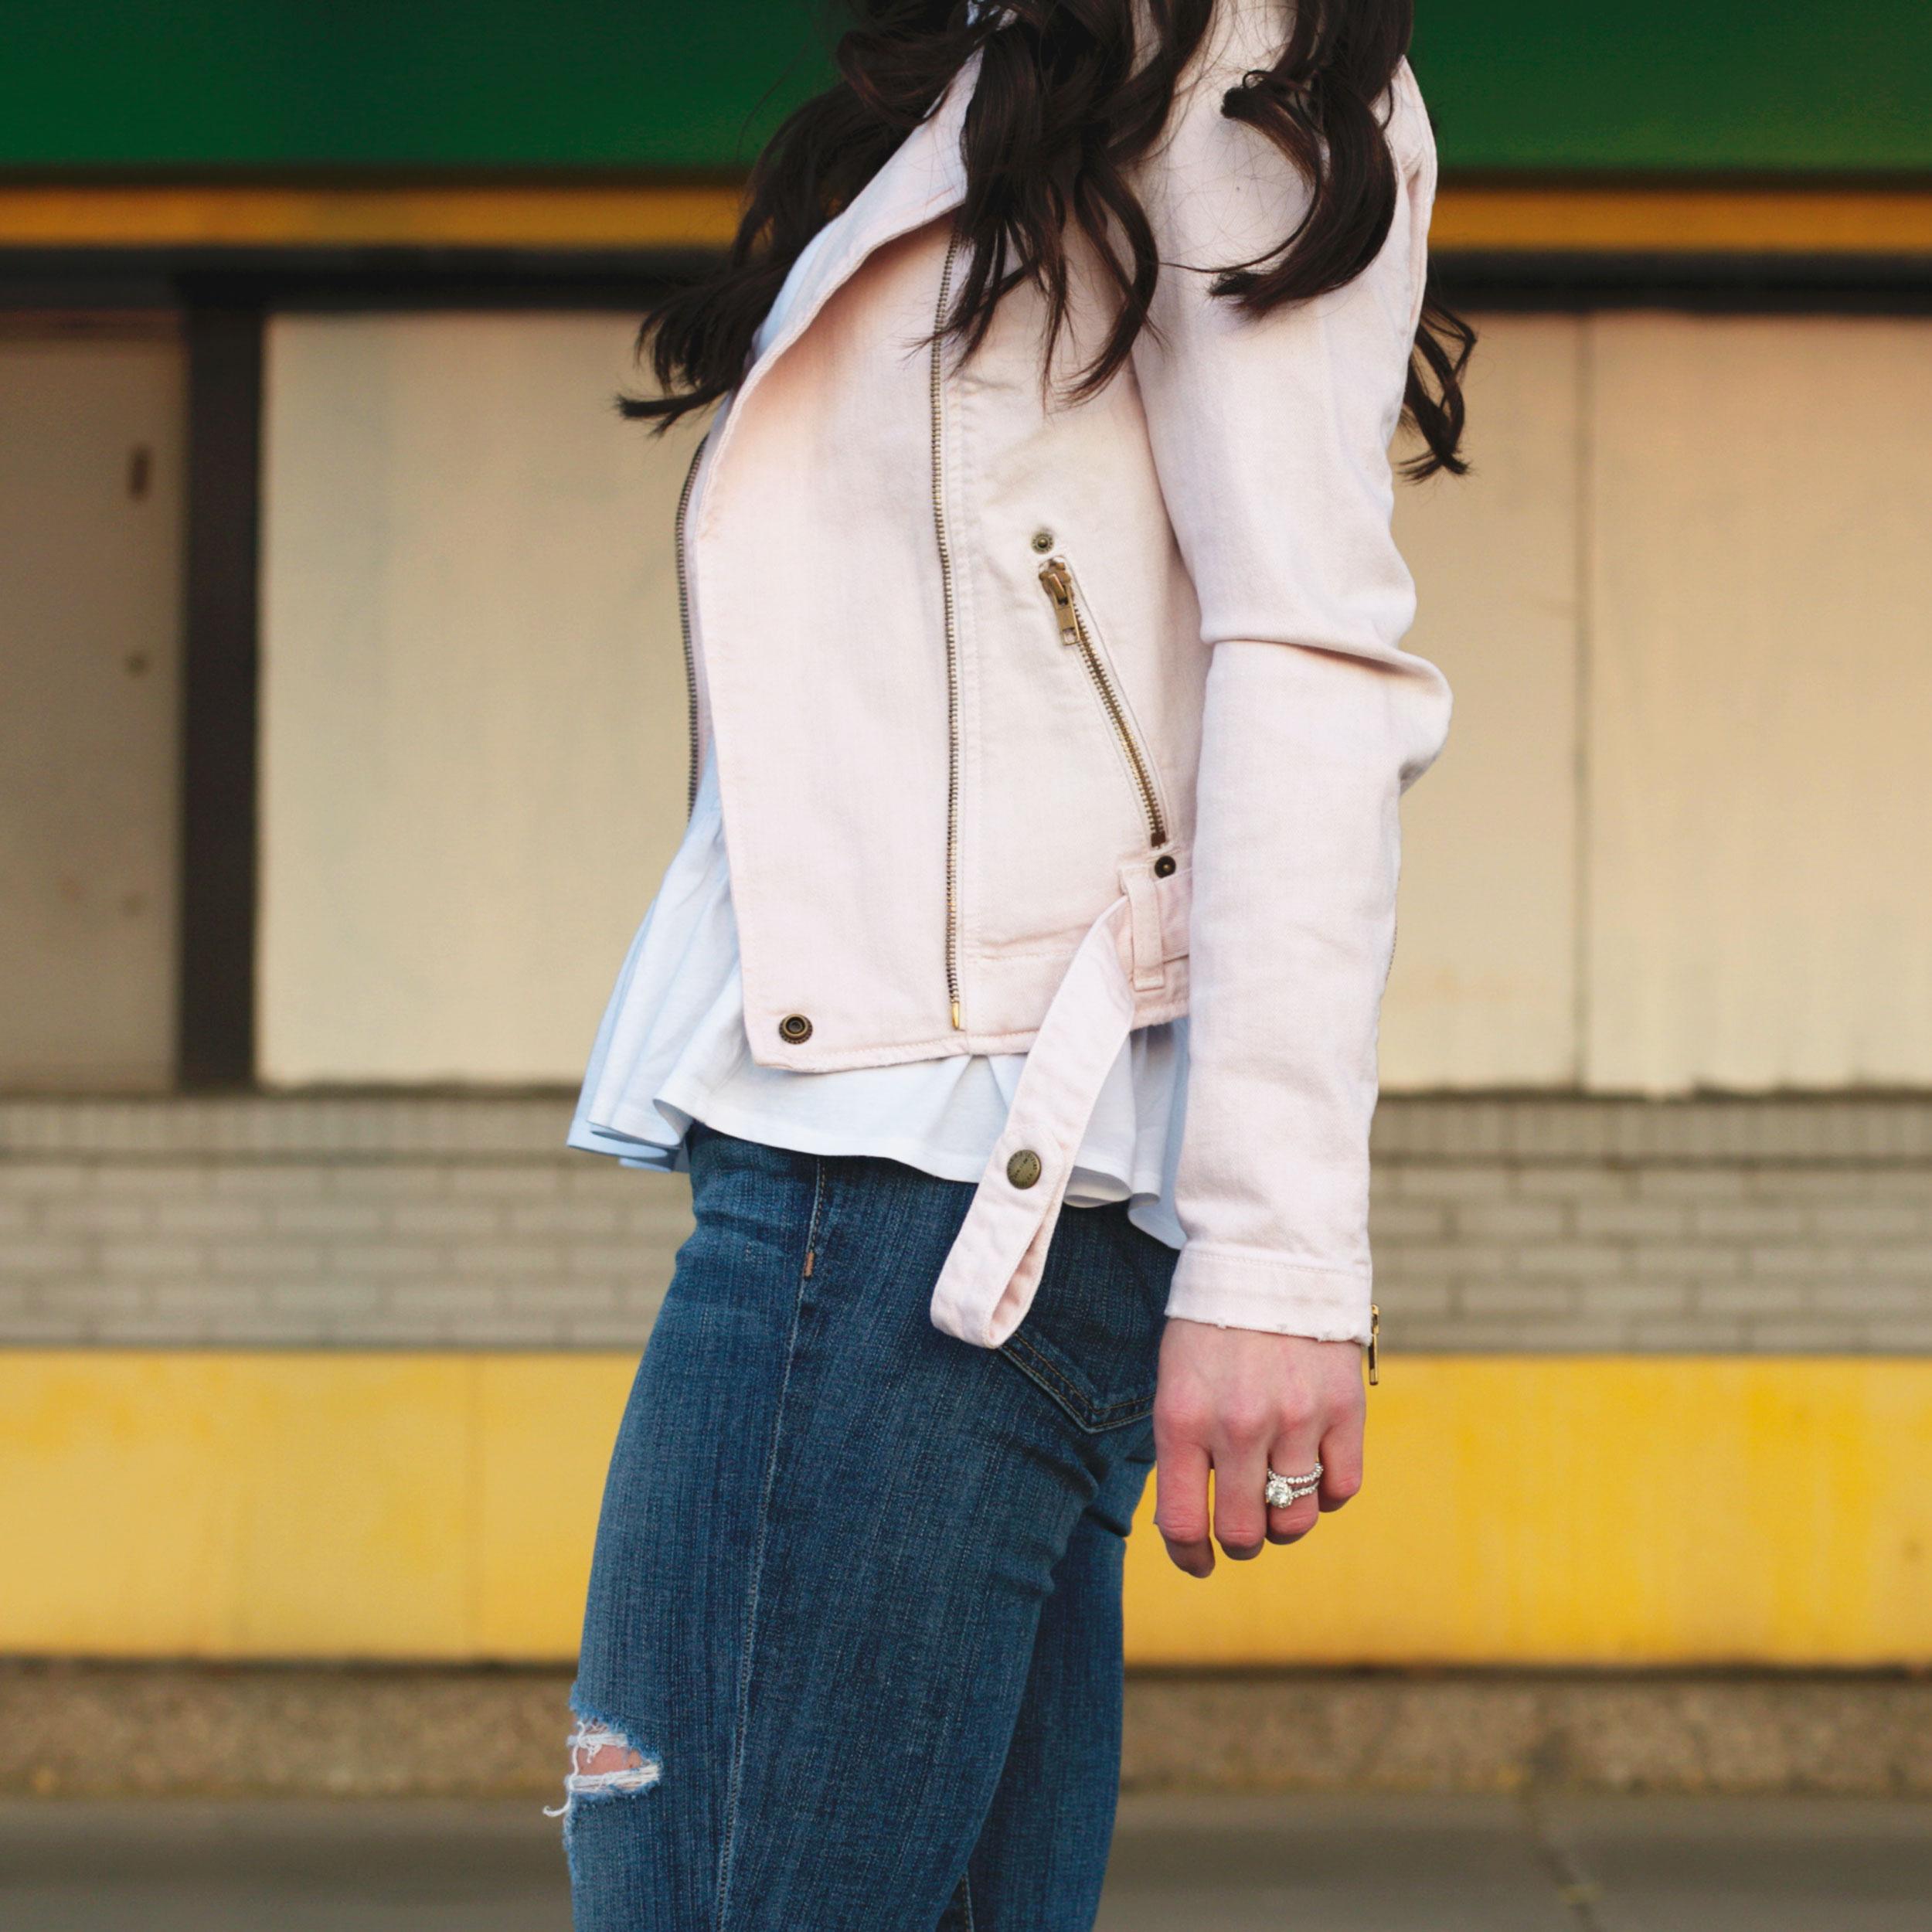 Current Elliott Denim Motorcycle Jacket, Peplum T-Shirt, Destroyed Joe's Jeans, White Chuck Taylors, Spring Style, Fashion Blogger